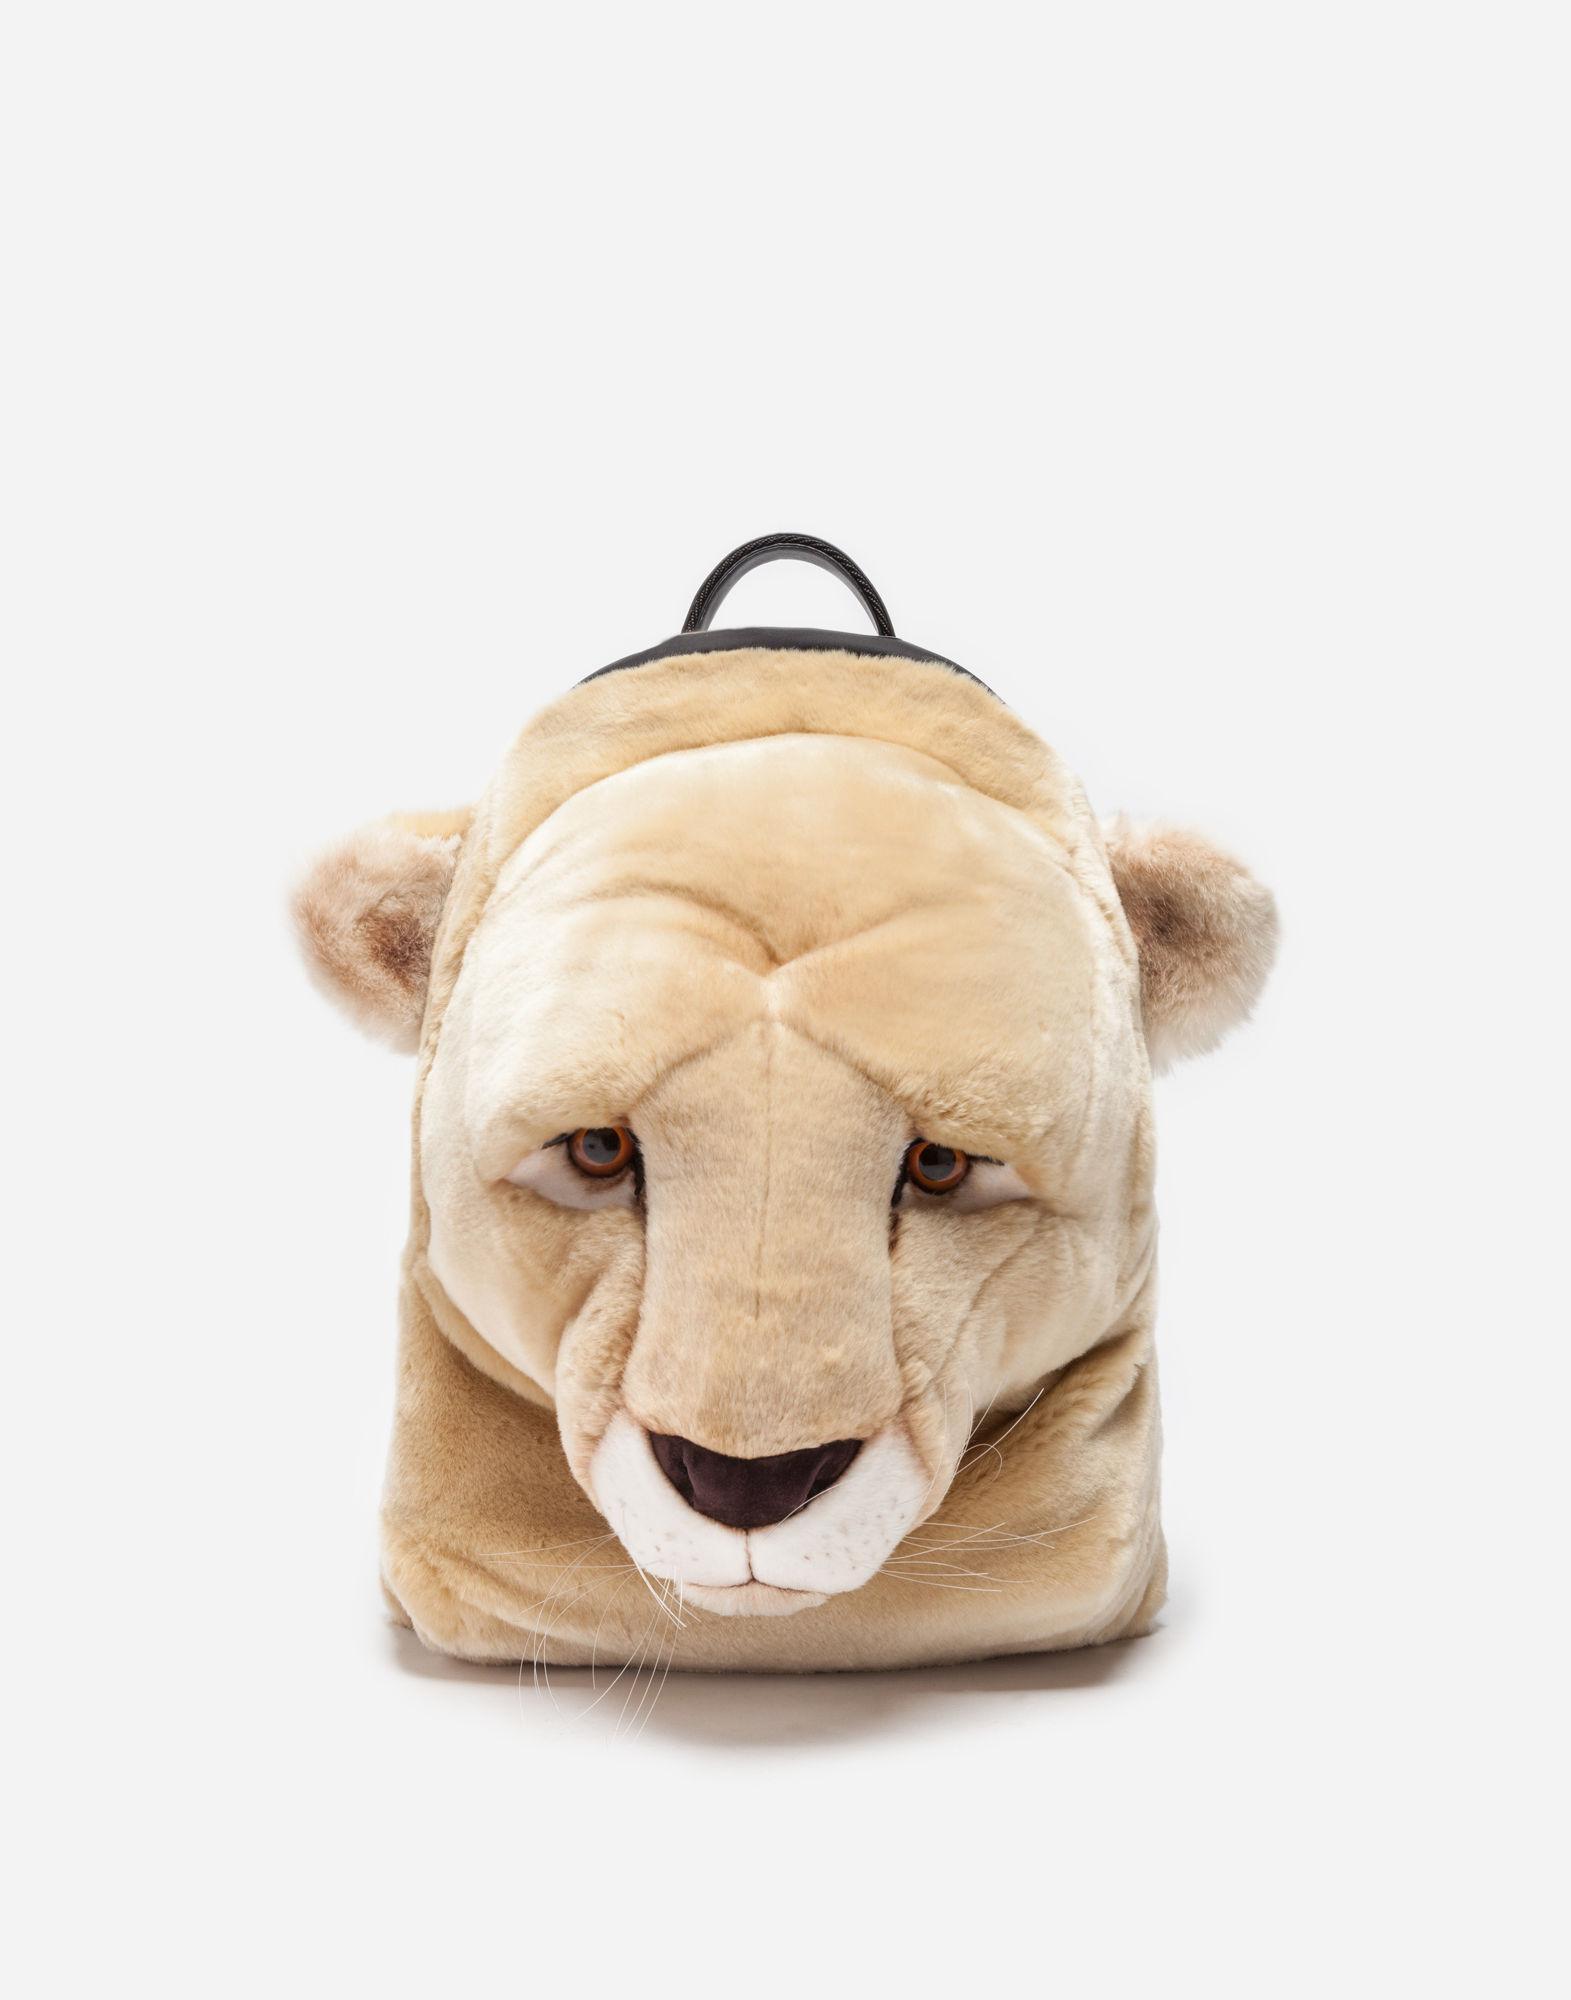 Dolce & Gabbana Orso faux fur backpack Buy Cheap Sale Vgqp3kS0Iu